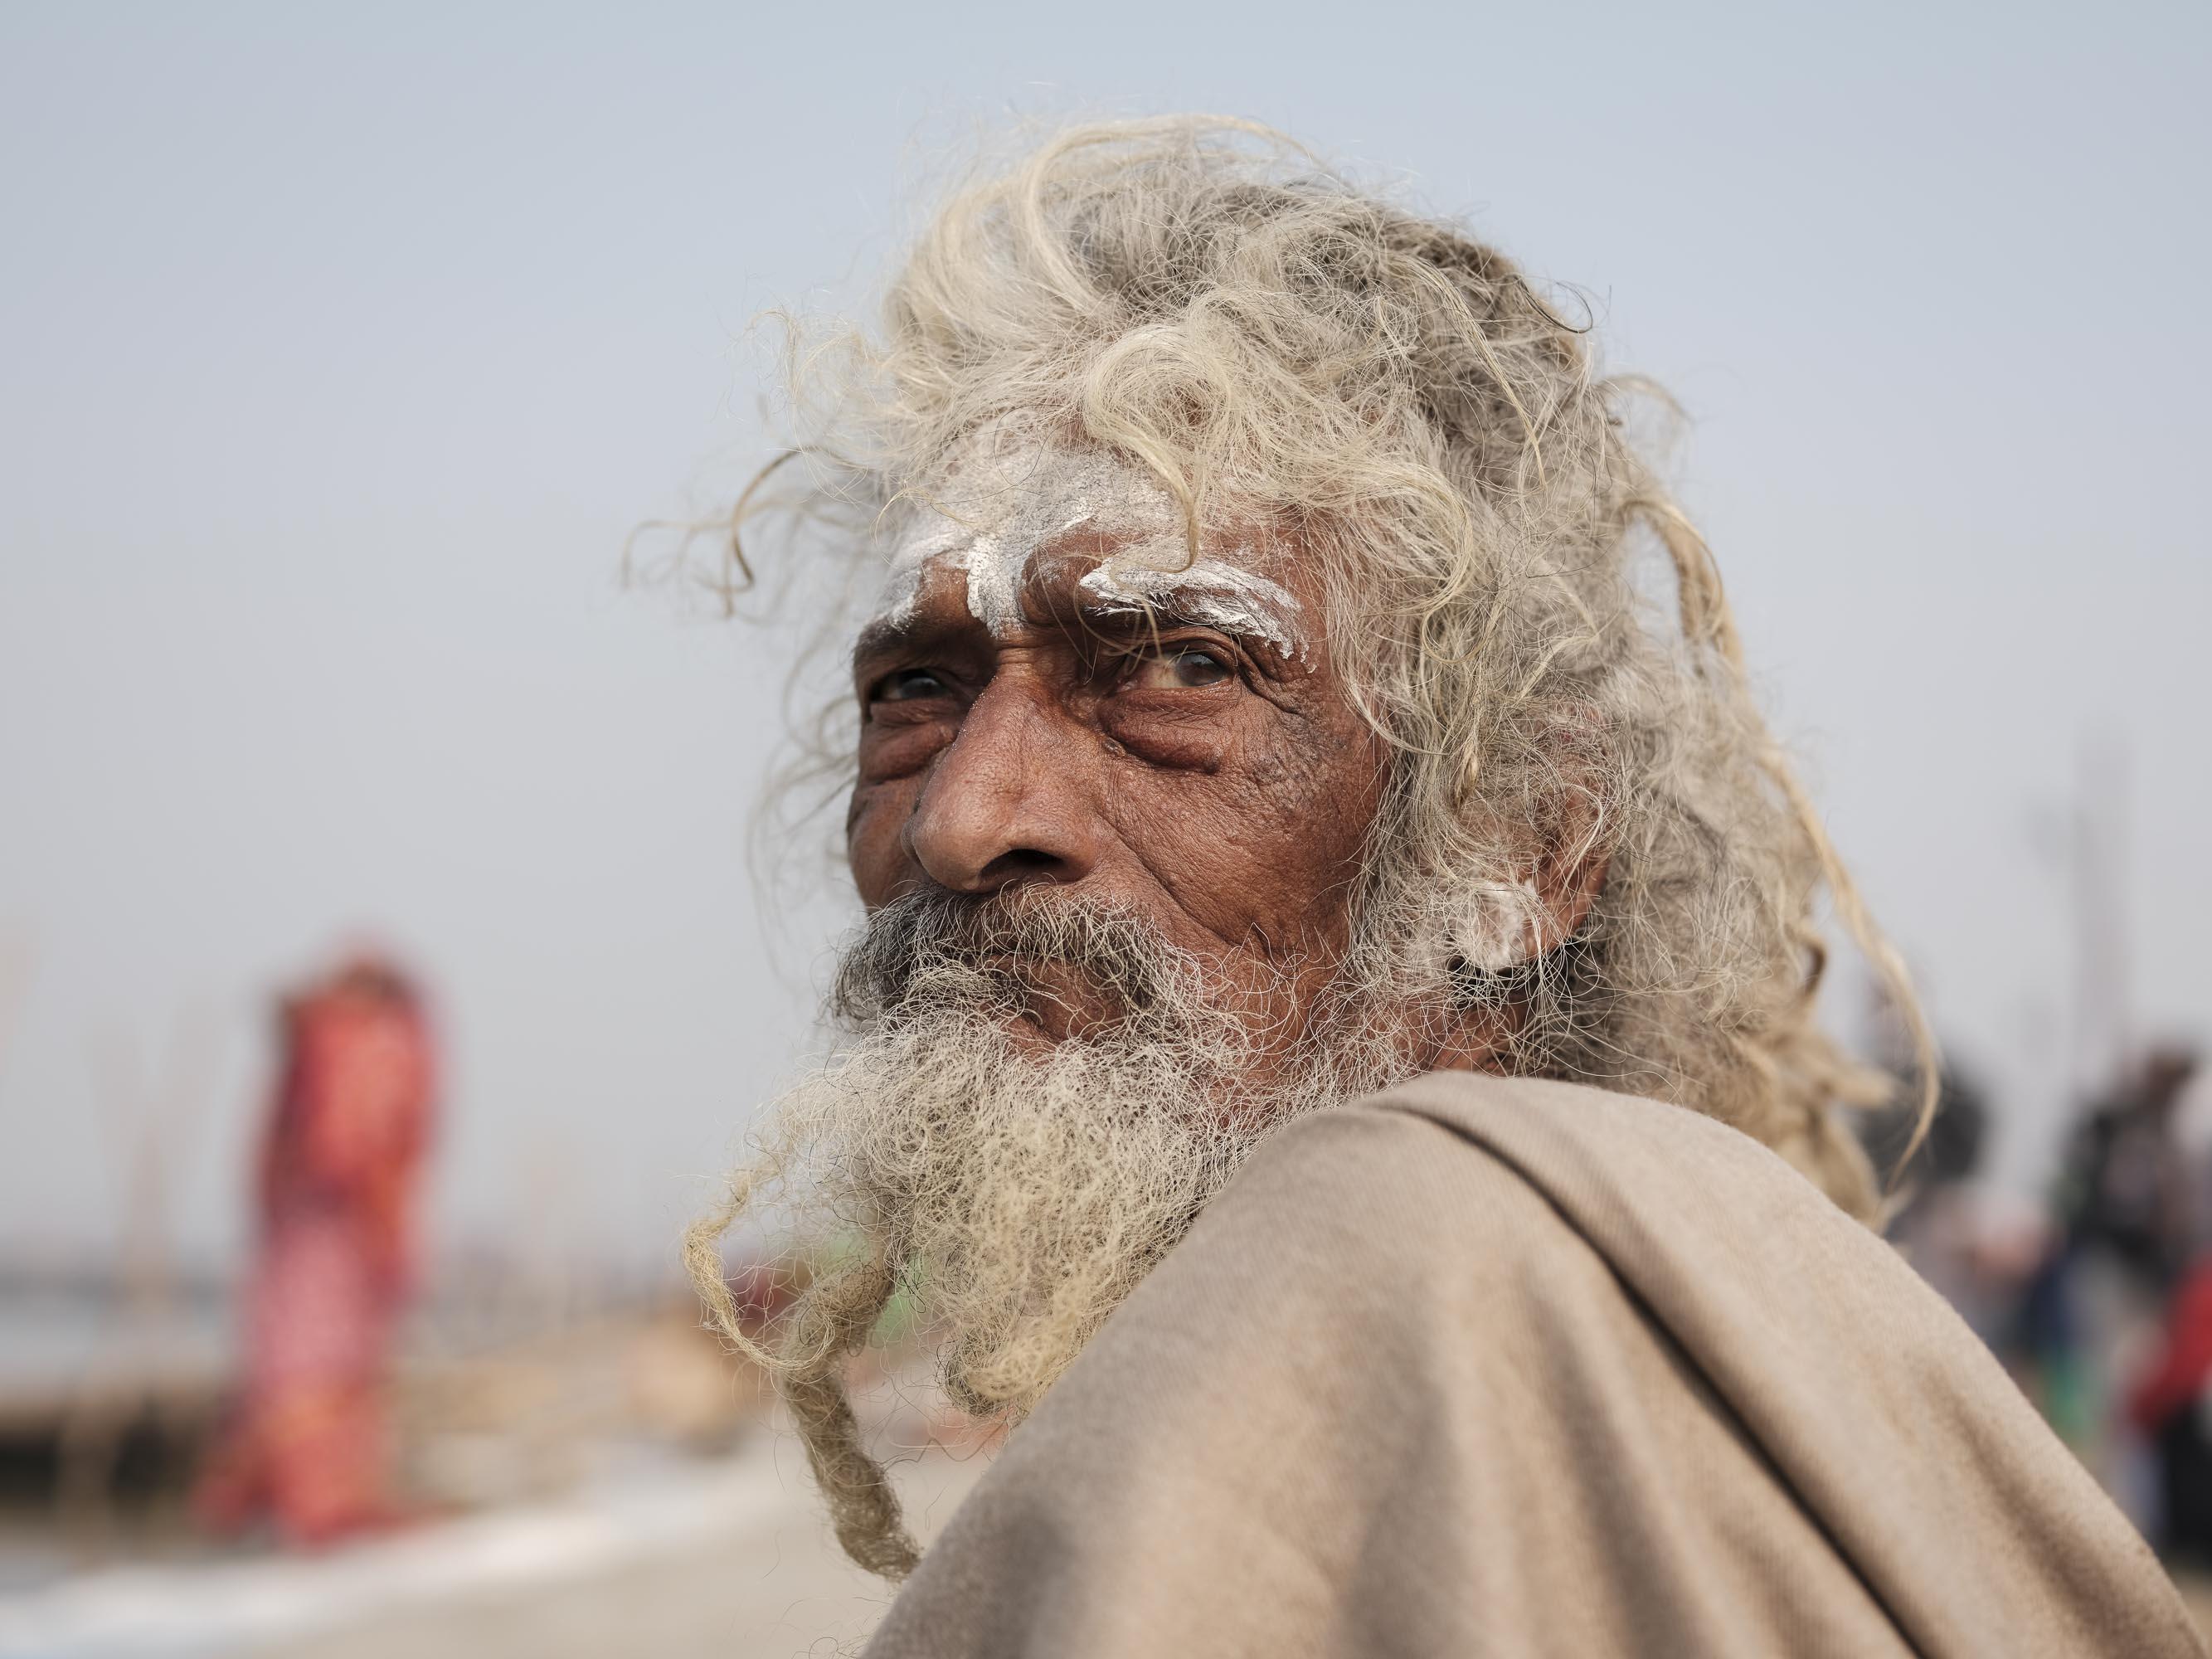 portrait old man after a bath pilgrims Kumbh mela 2019 India Allahabad Prayagraj Ardh hindu religious Festival event rivers photographer jose jeuland photography